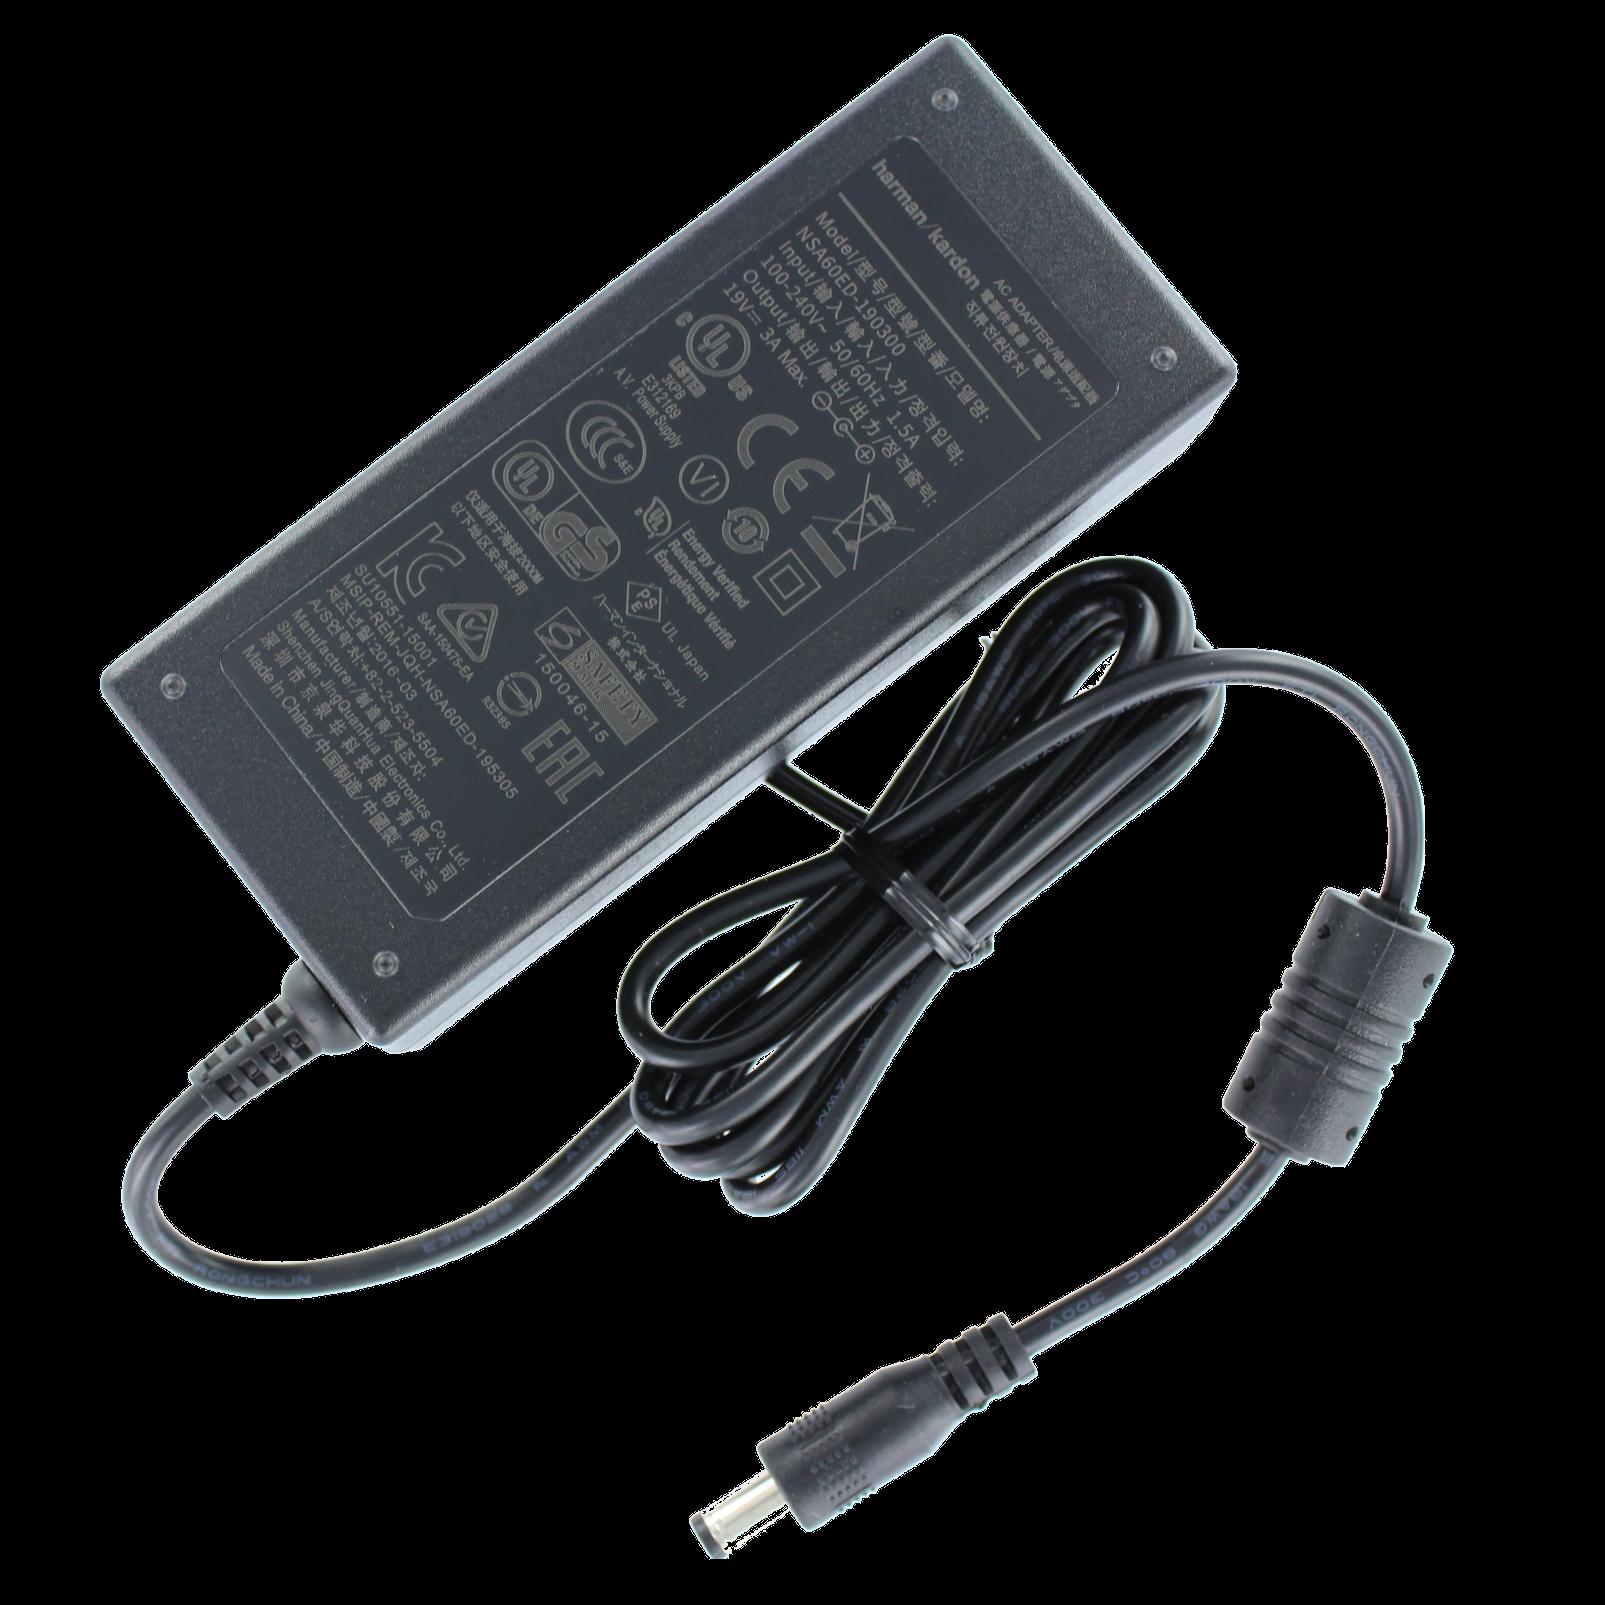 Power adapter, GoPlay mini - Black - Power adaptor - Hero